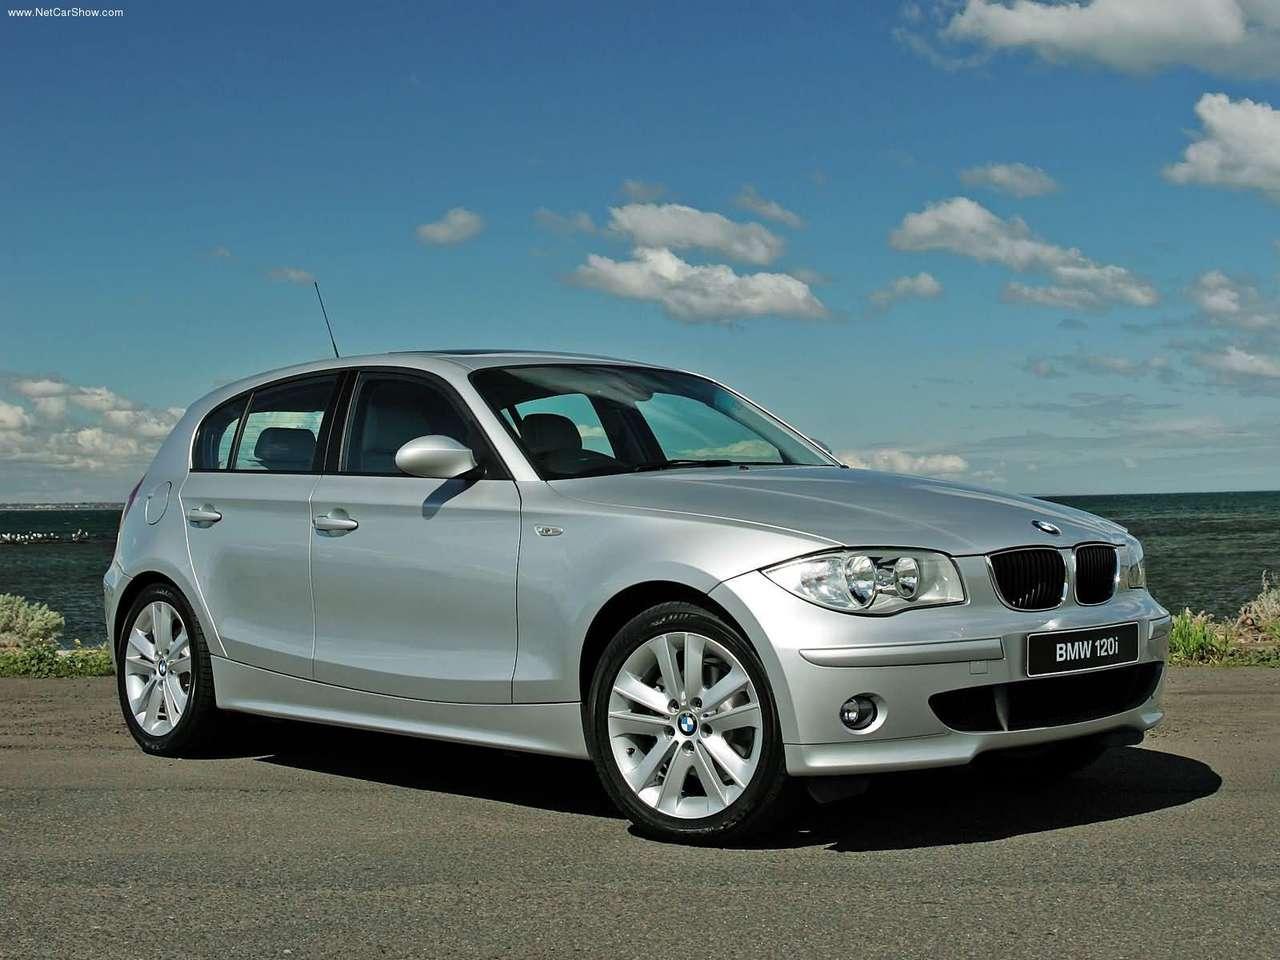 2005 BMW 120i UK Version